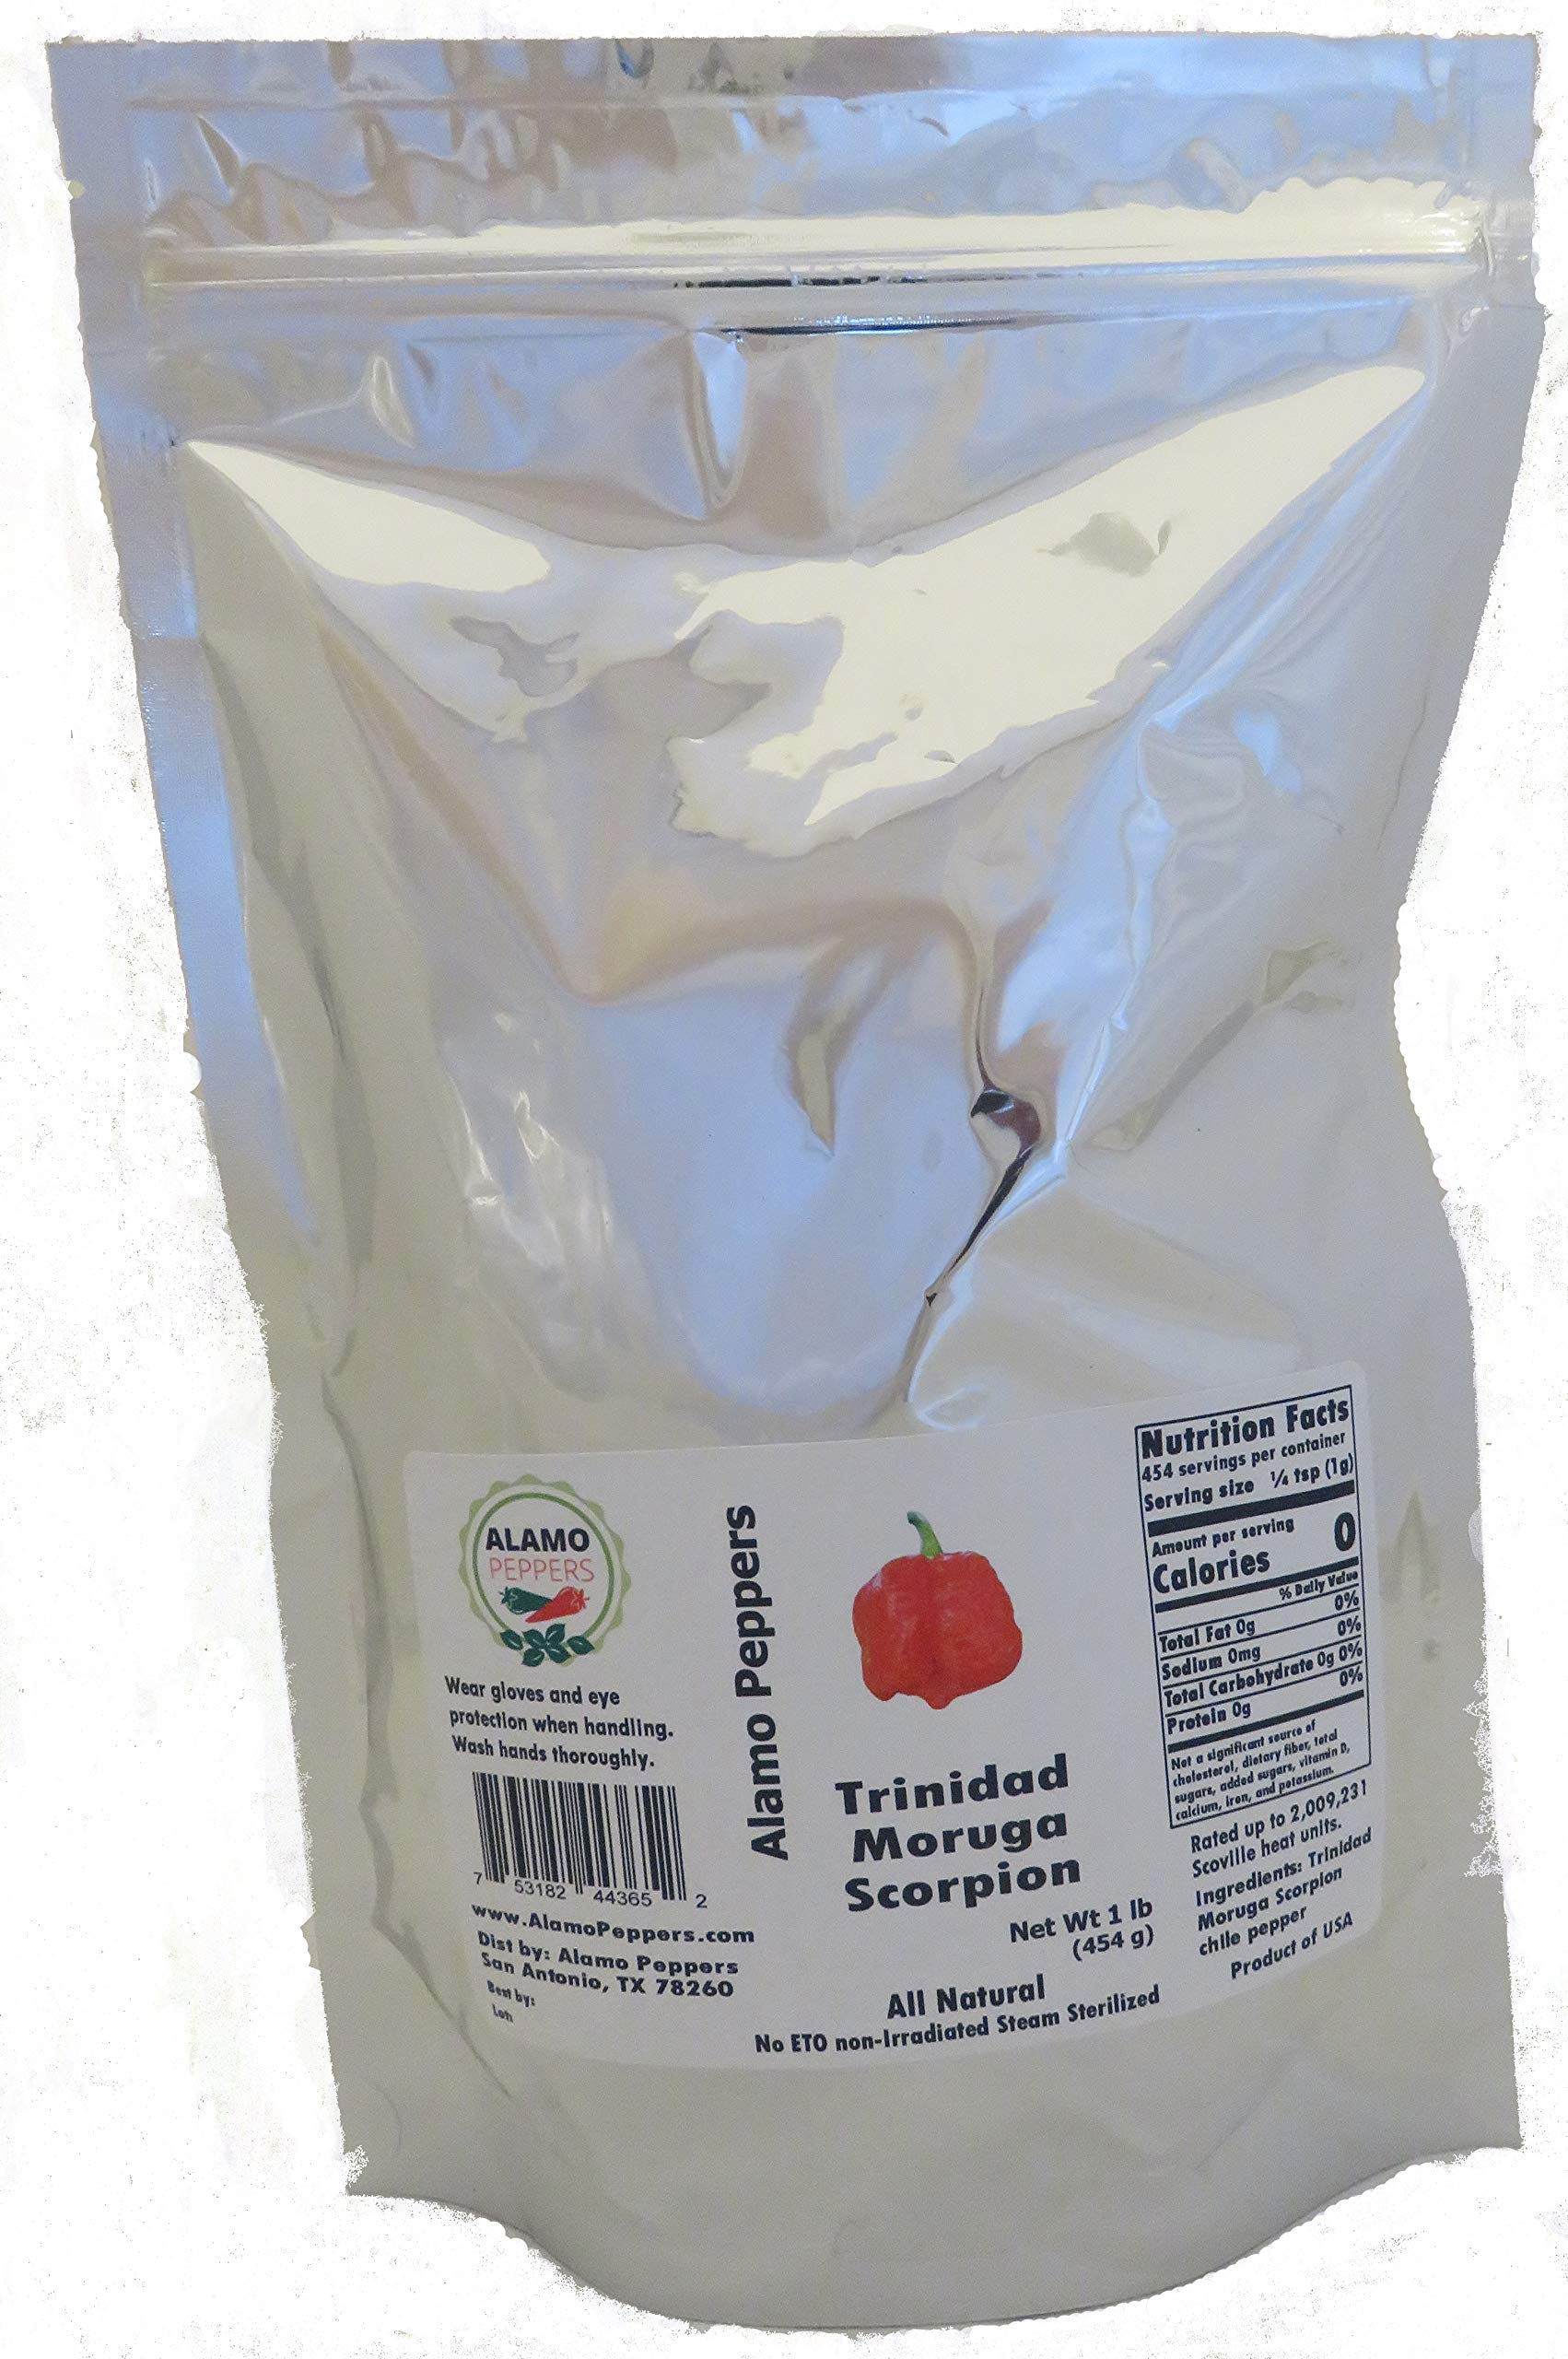 Alamo Peppers Trinidad Moruga Scorpion Powder 1 Pound (lb)